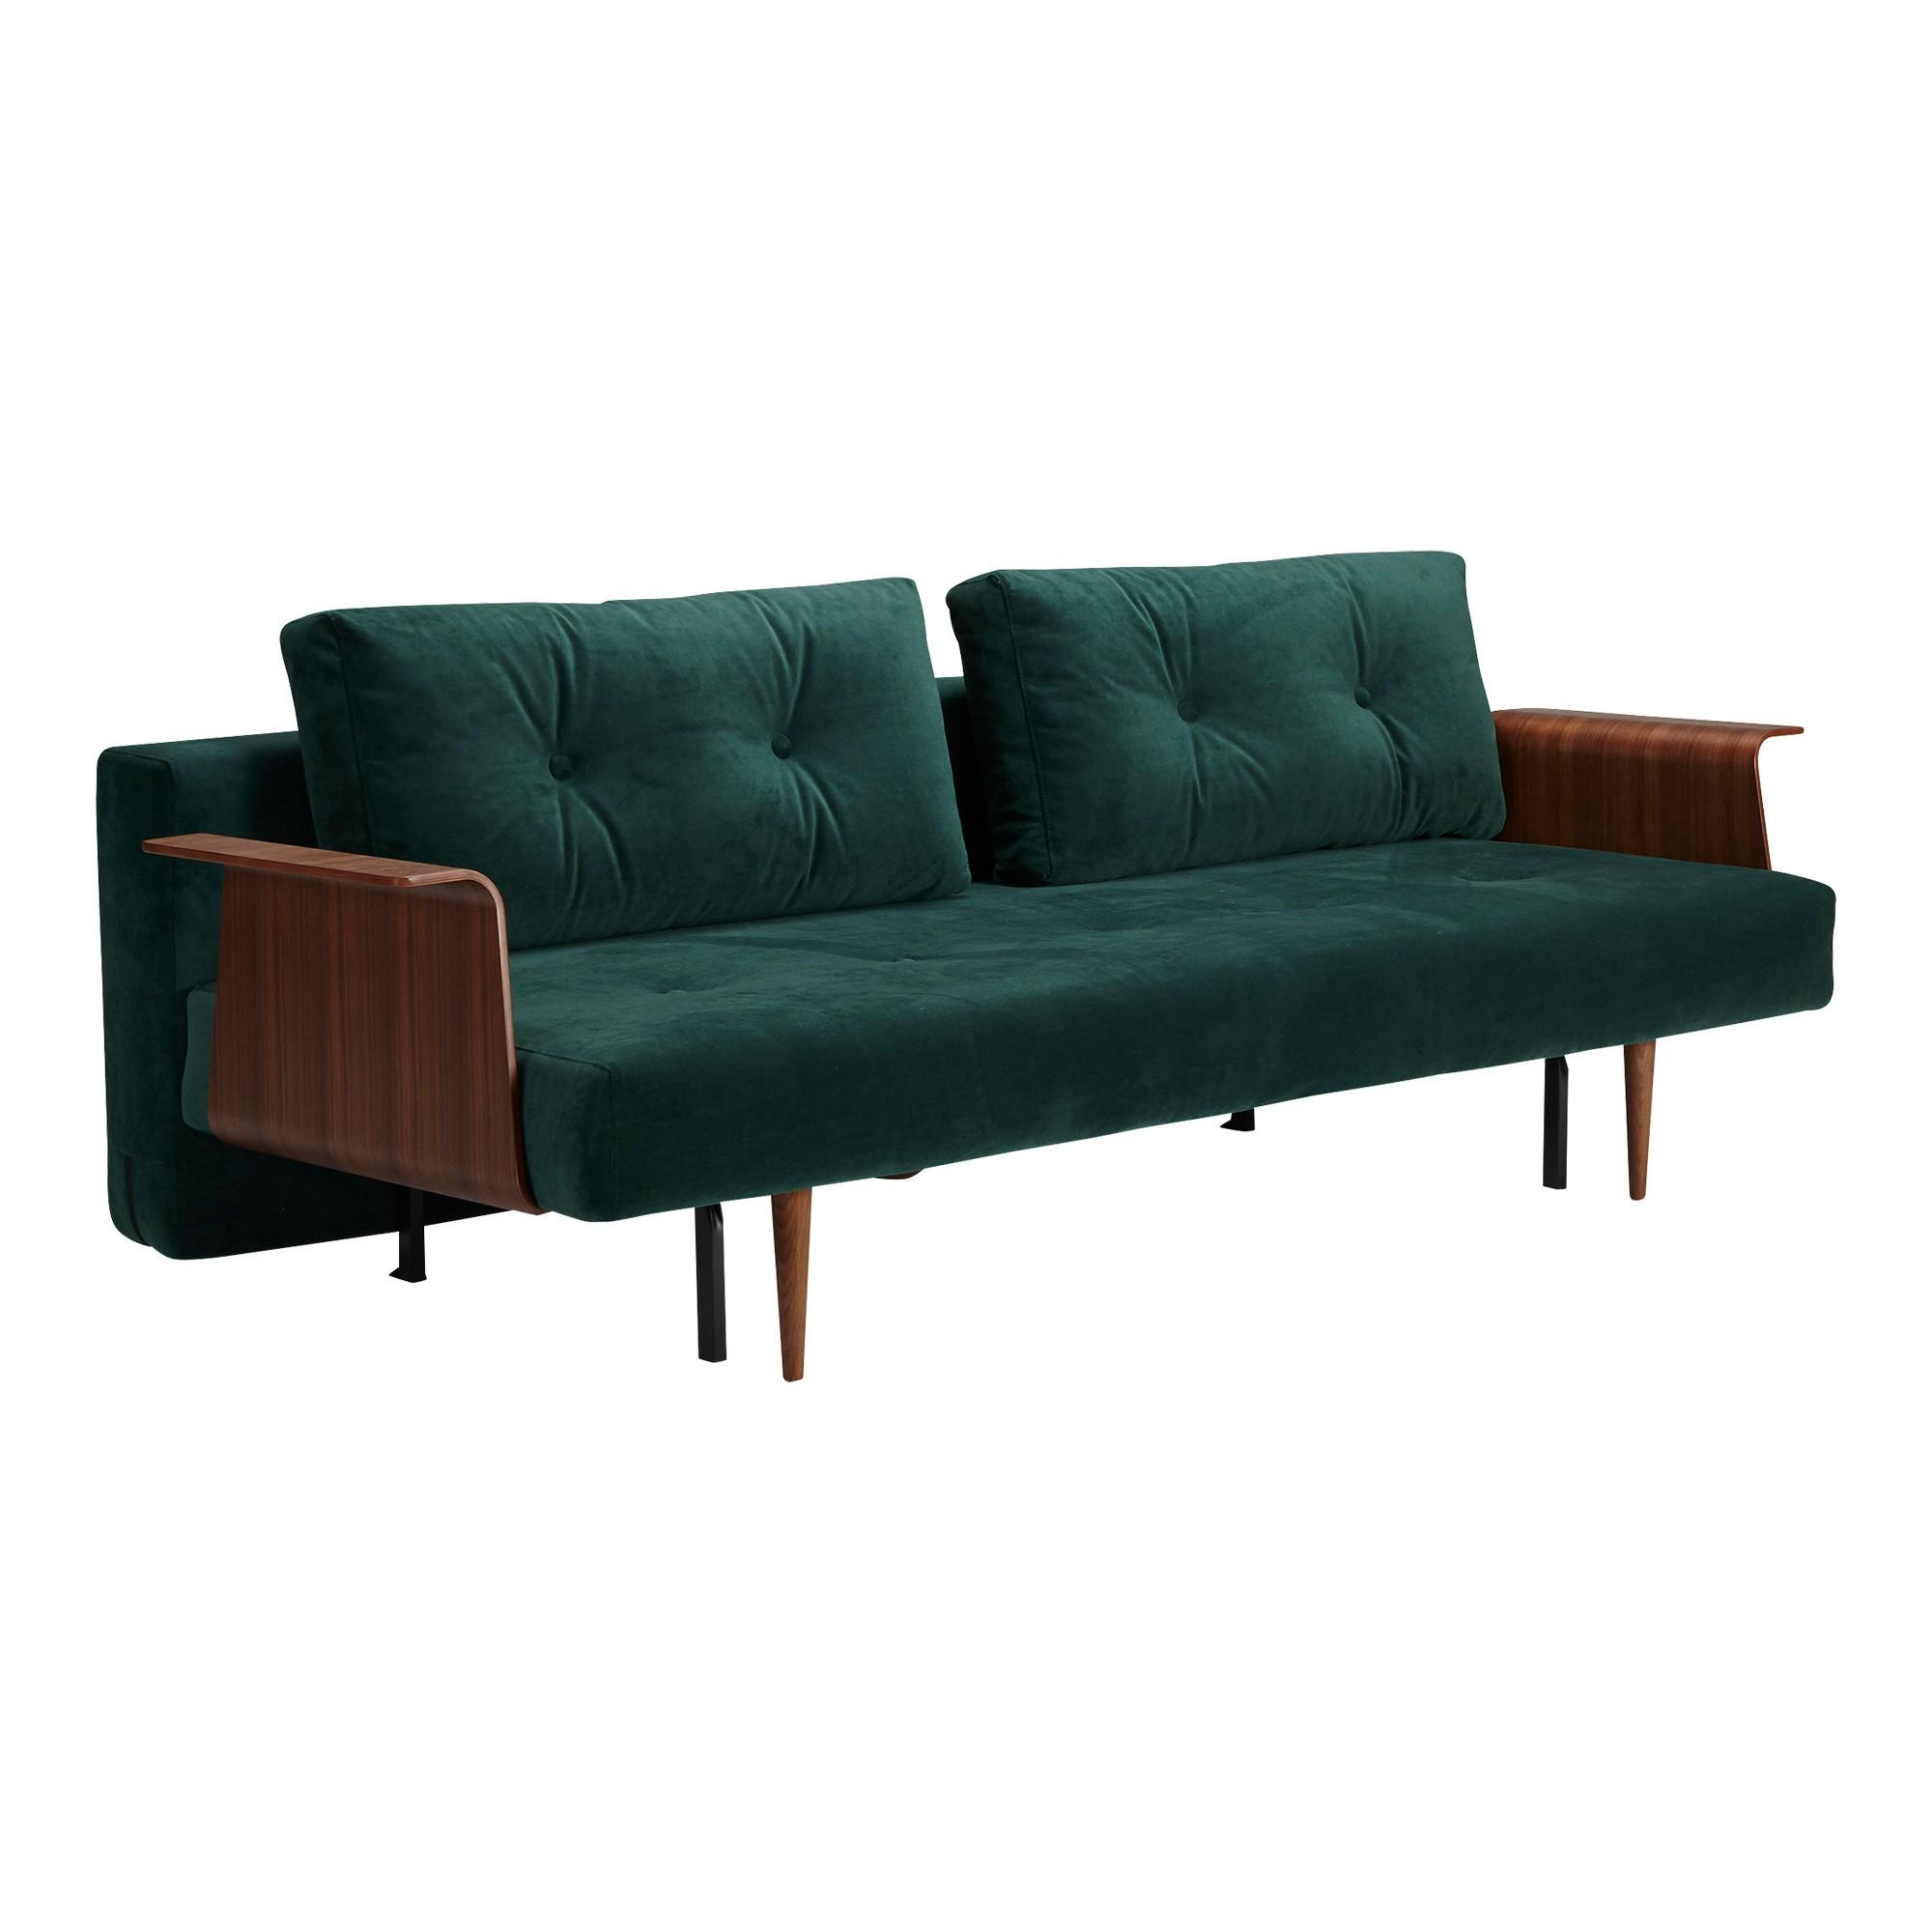 Enjoyable Recast Plus Sofa Bed With Armrests Velvet Cjindustries Chair Design For Home Cjindustriesco